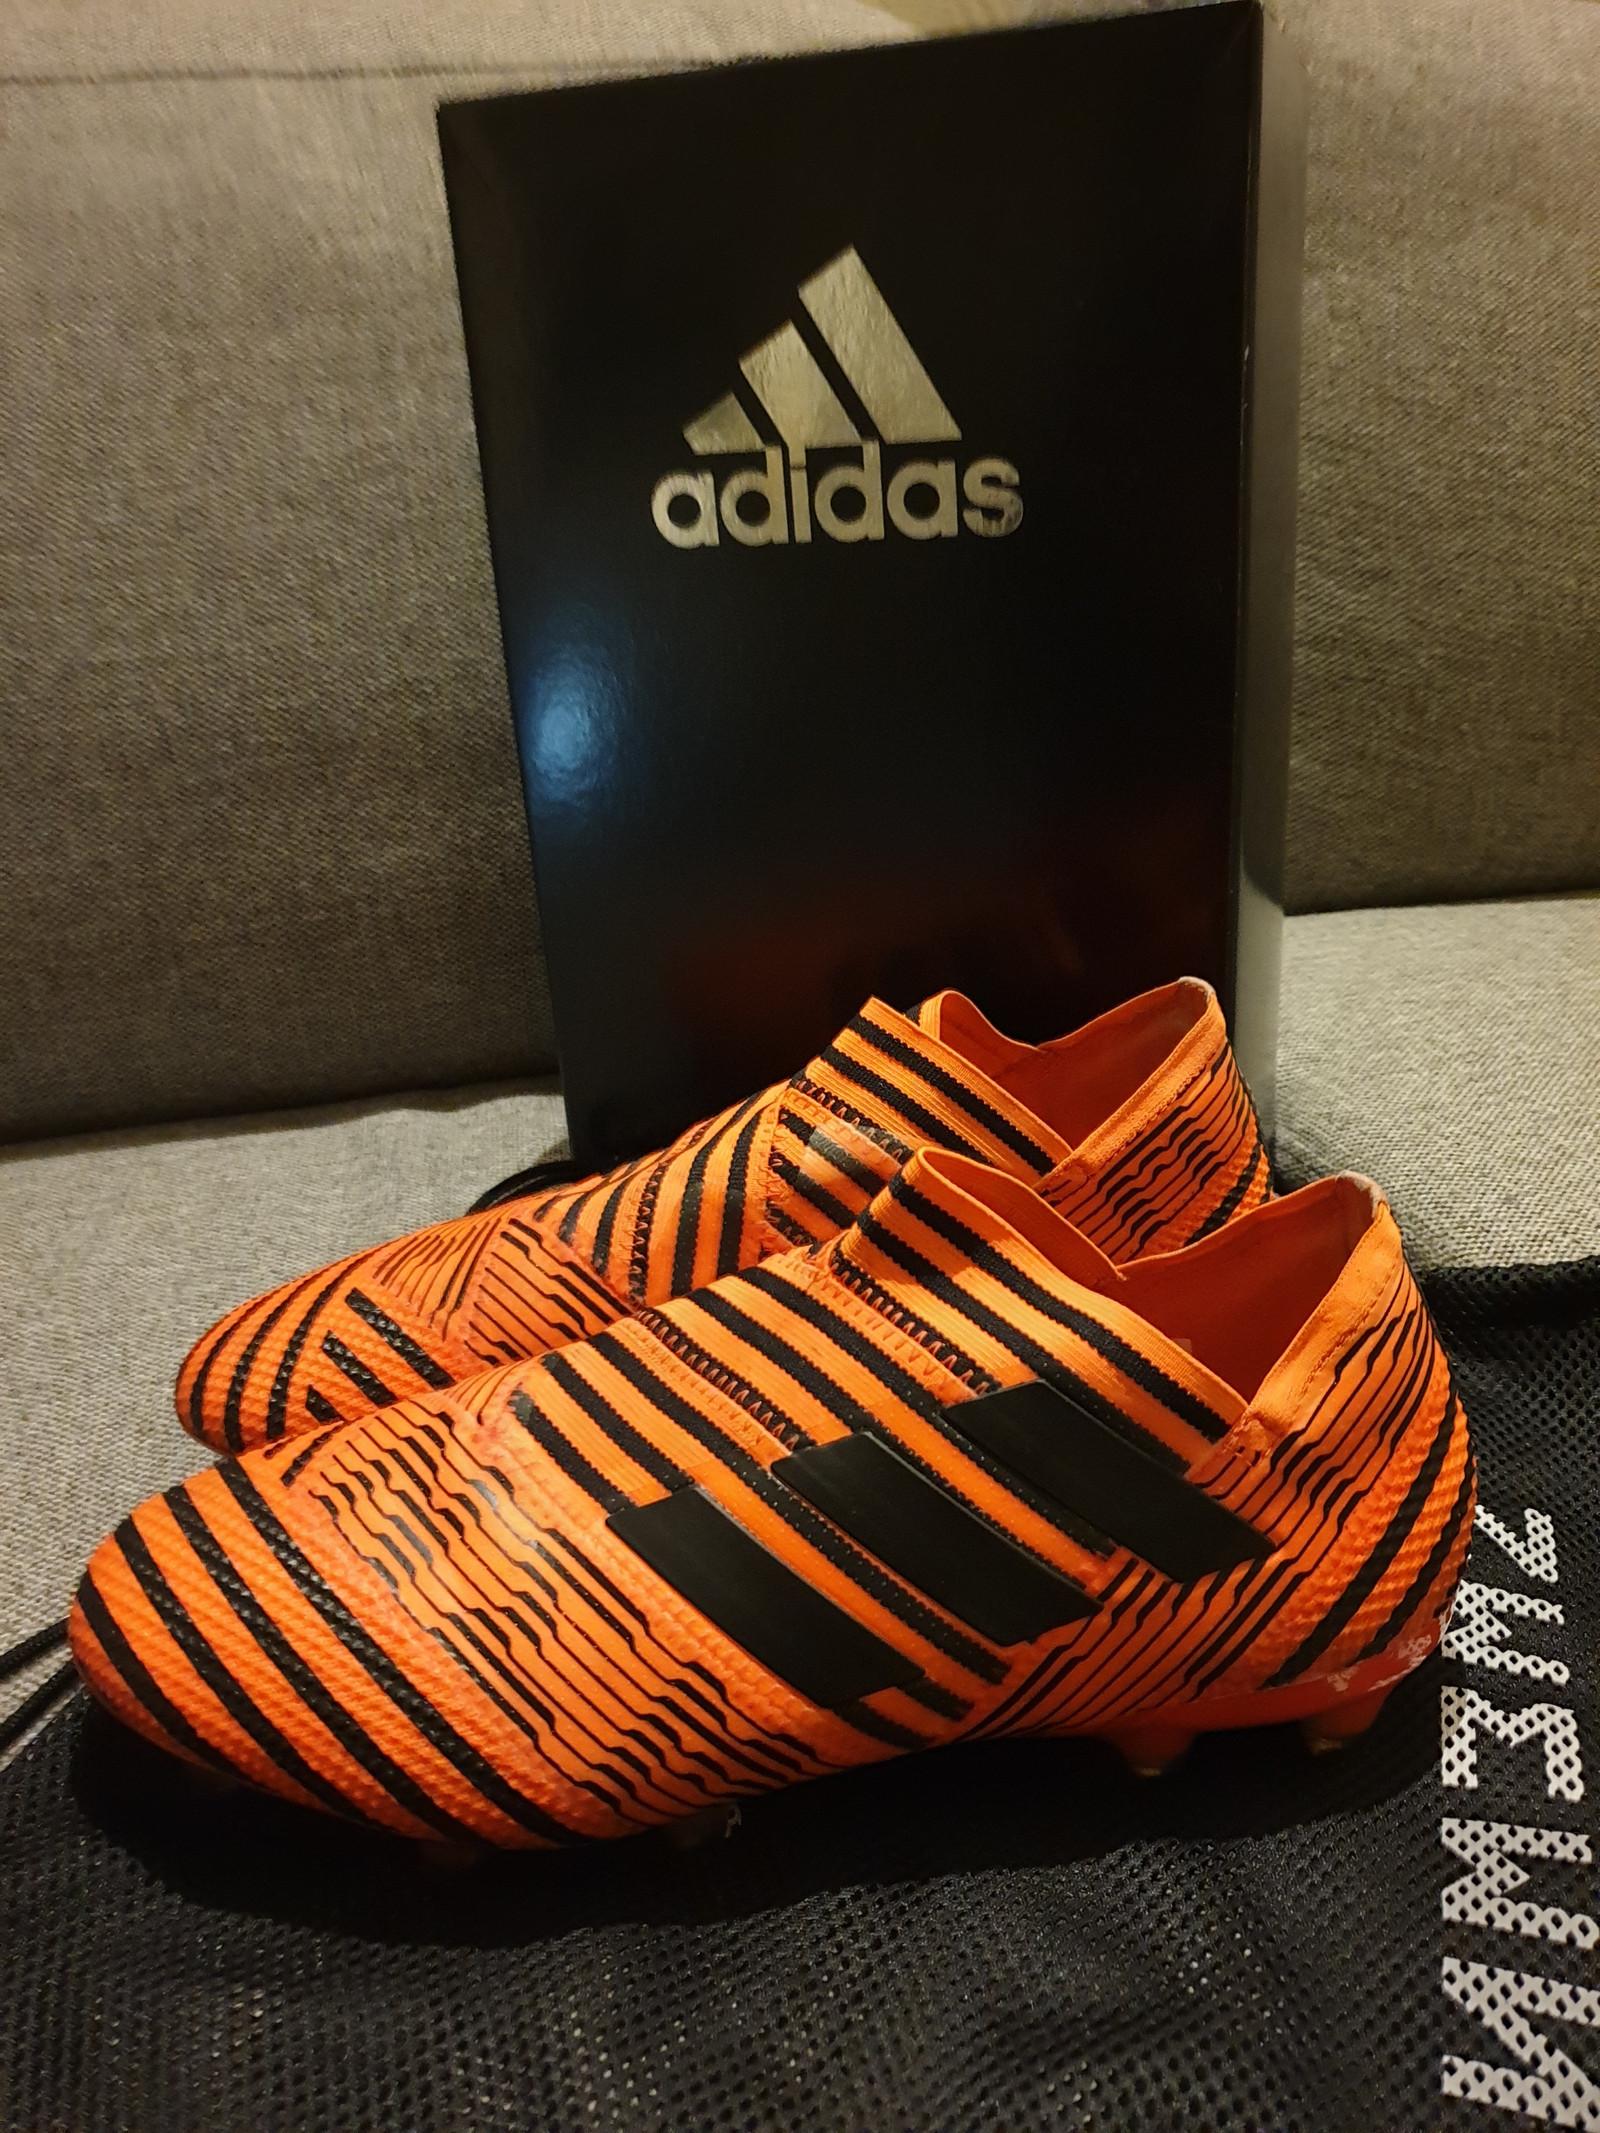 Adidas NEMEZIZ 17+360 agility FG | FINN.no